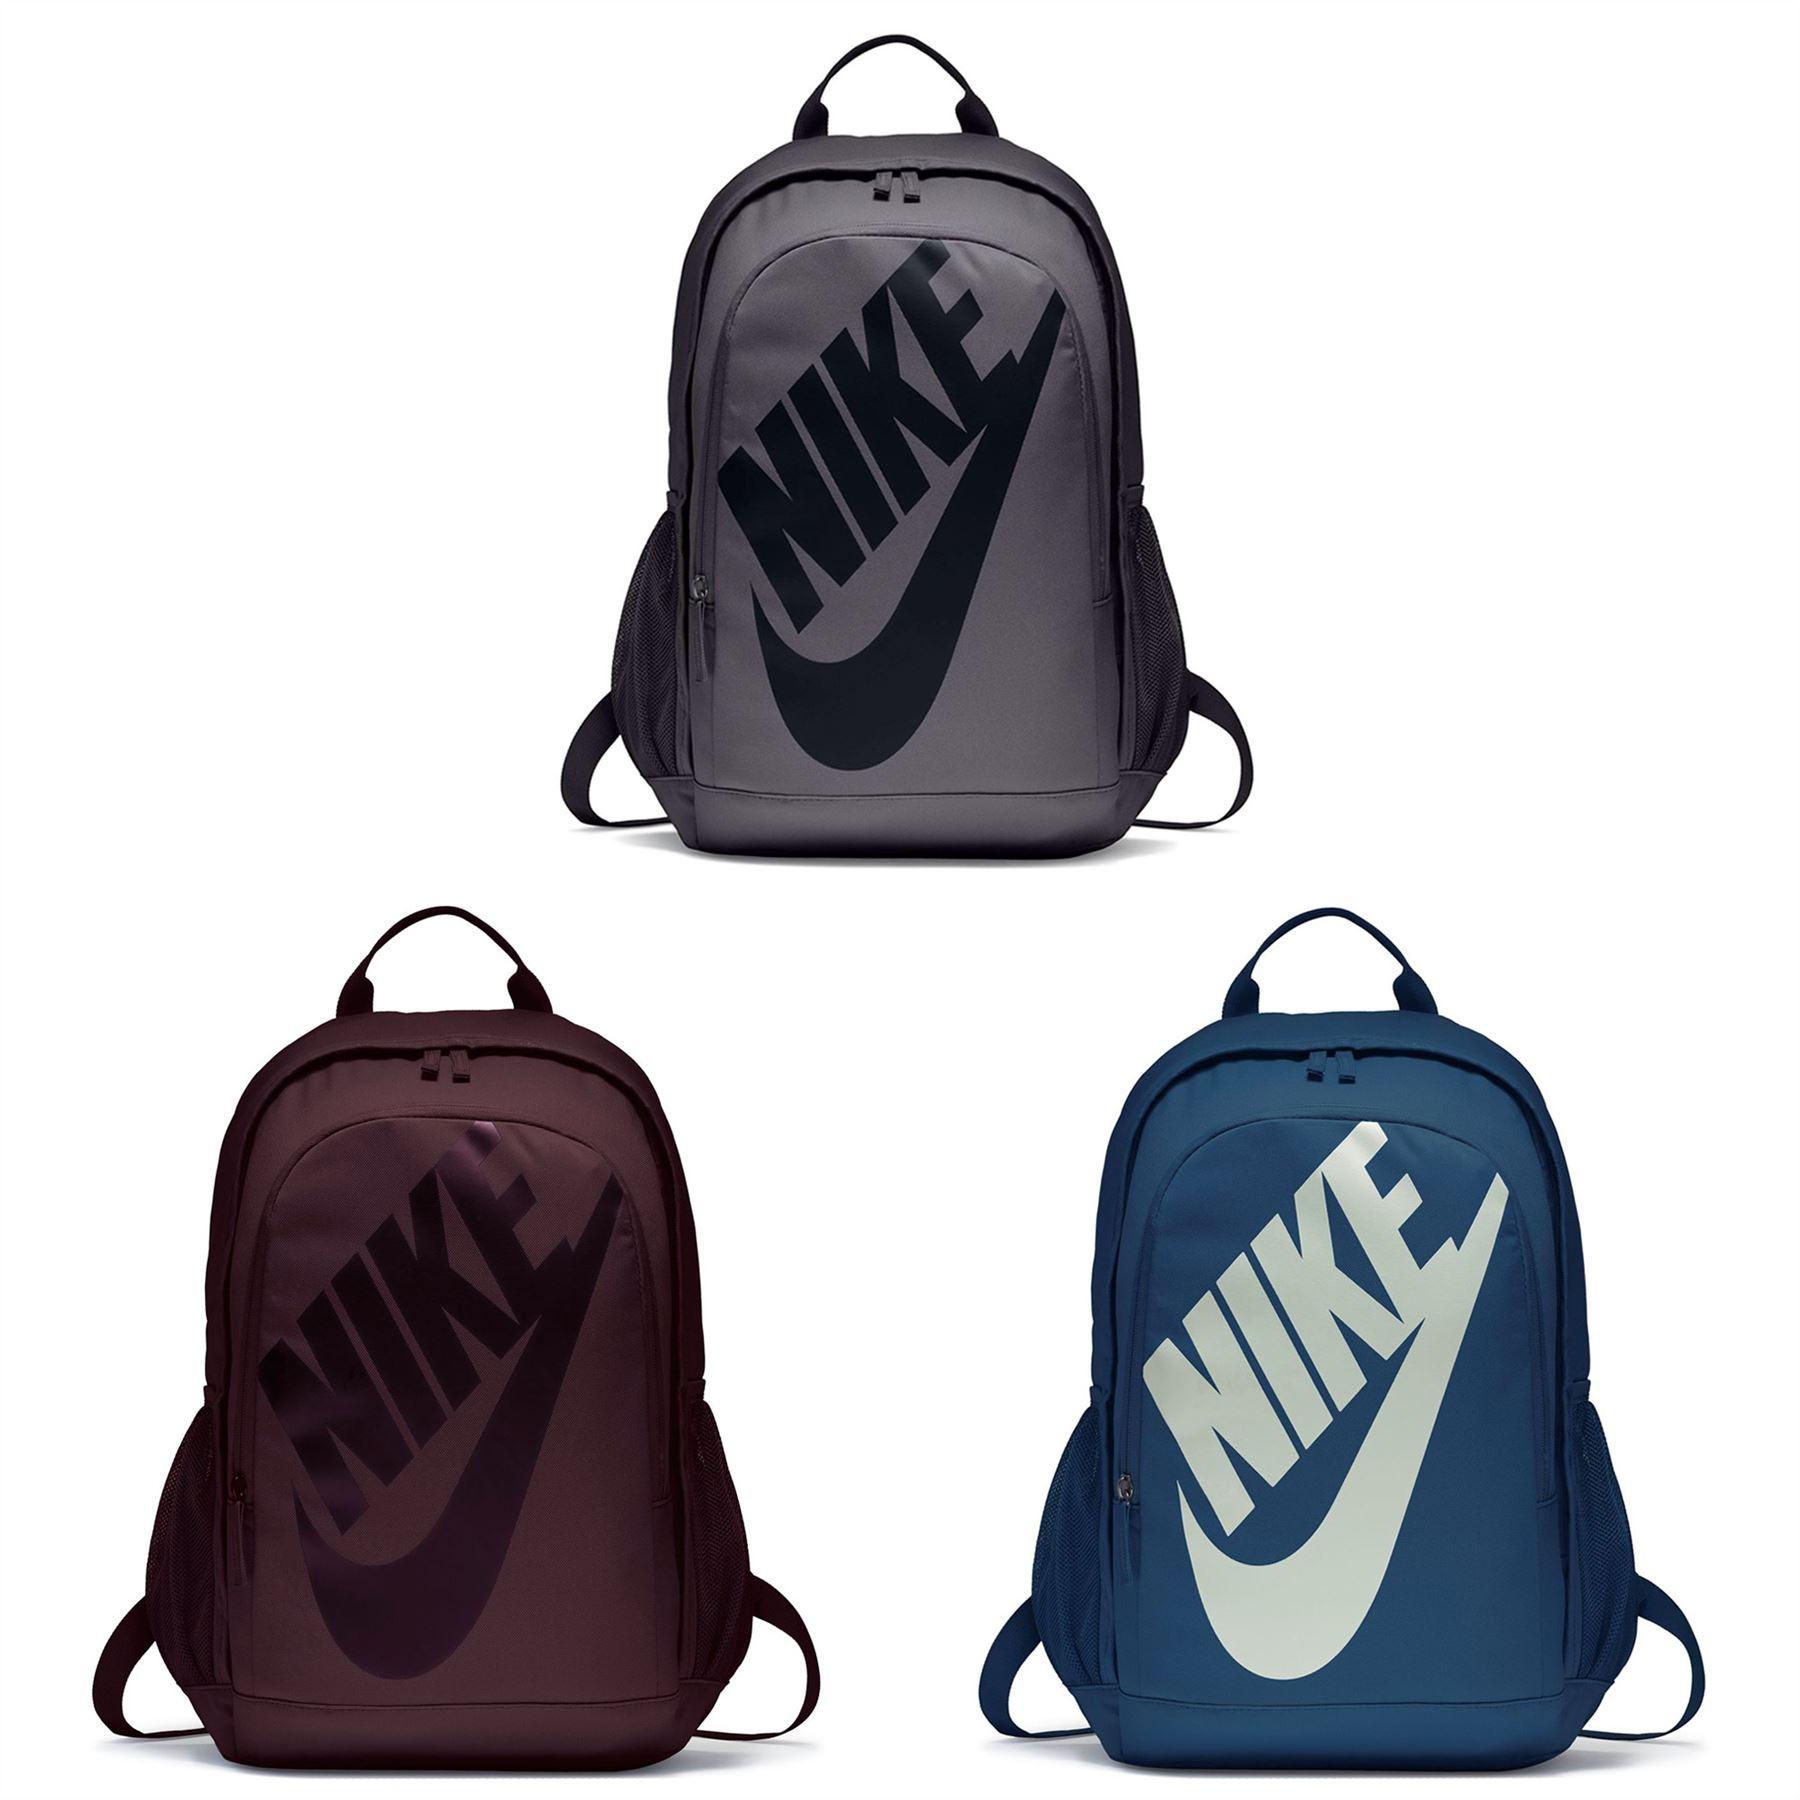 ... Nike Hayward Futura 2.0 Backpack Rucksack Daypack Bag ... f68270f9cad0d